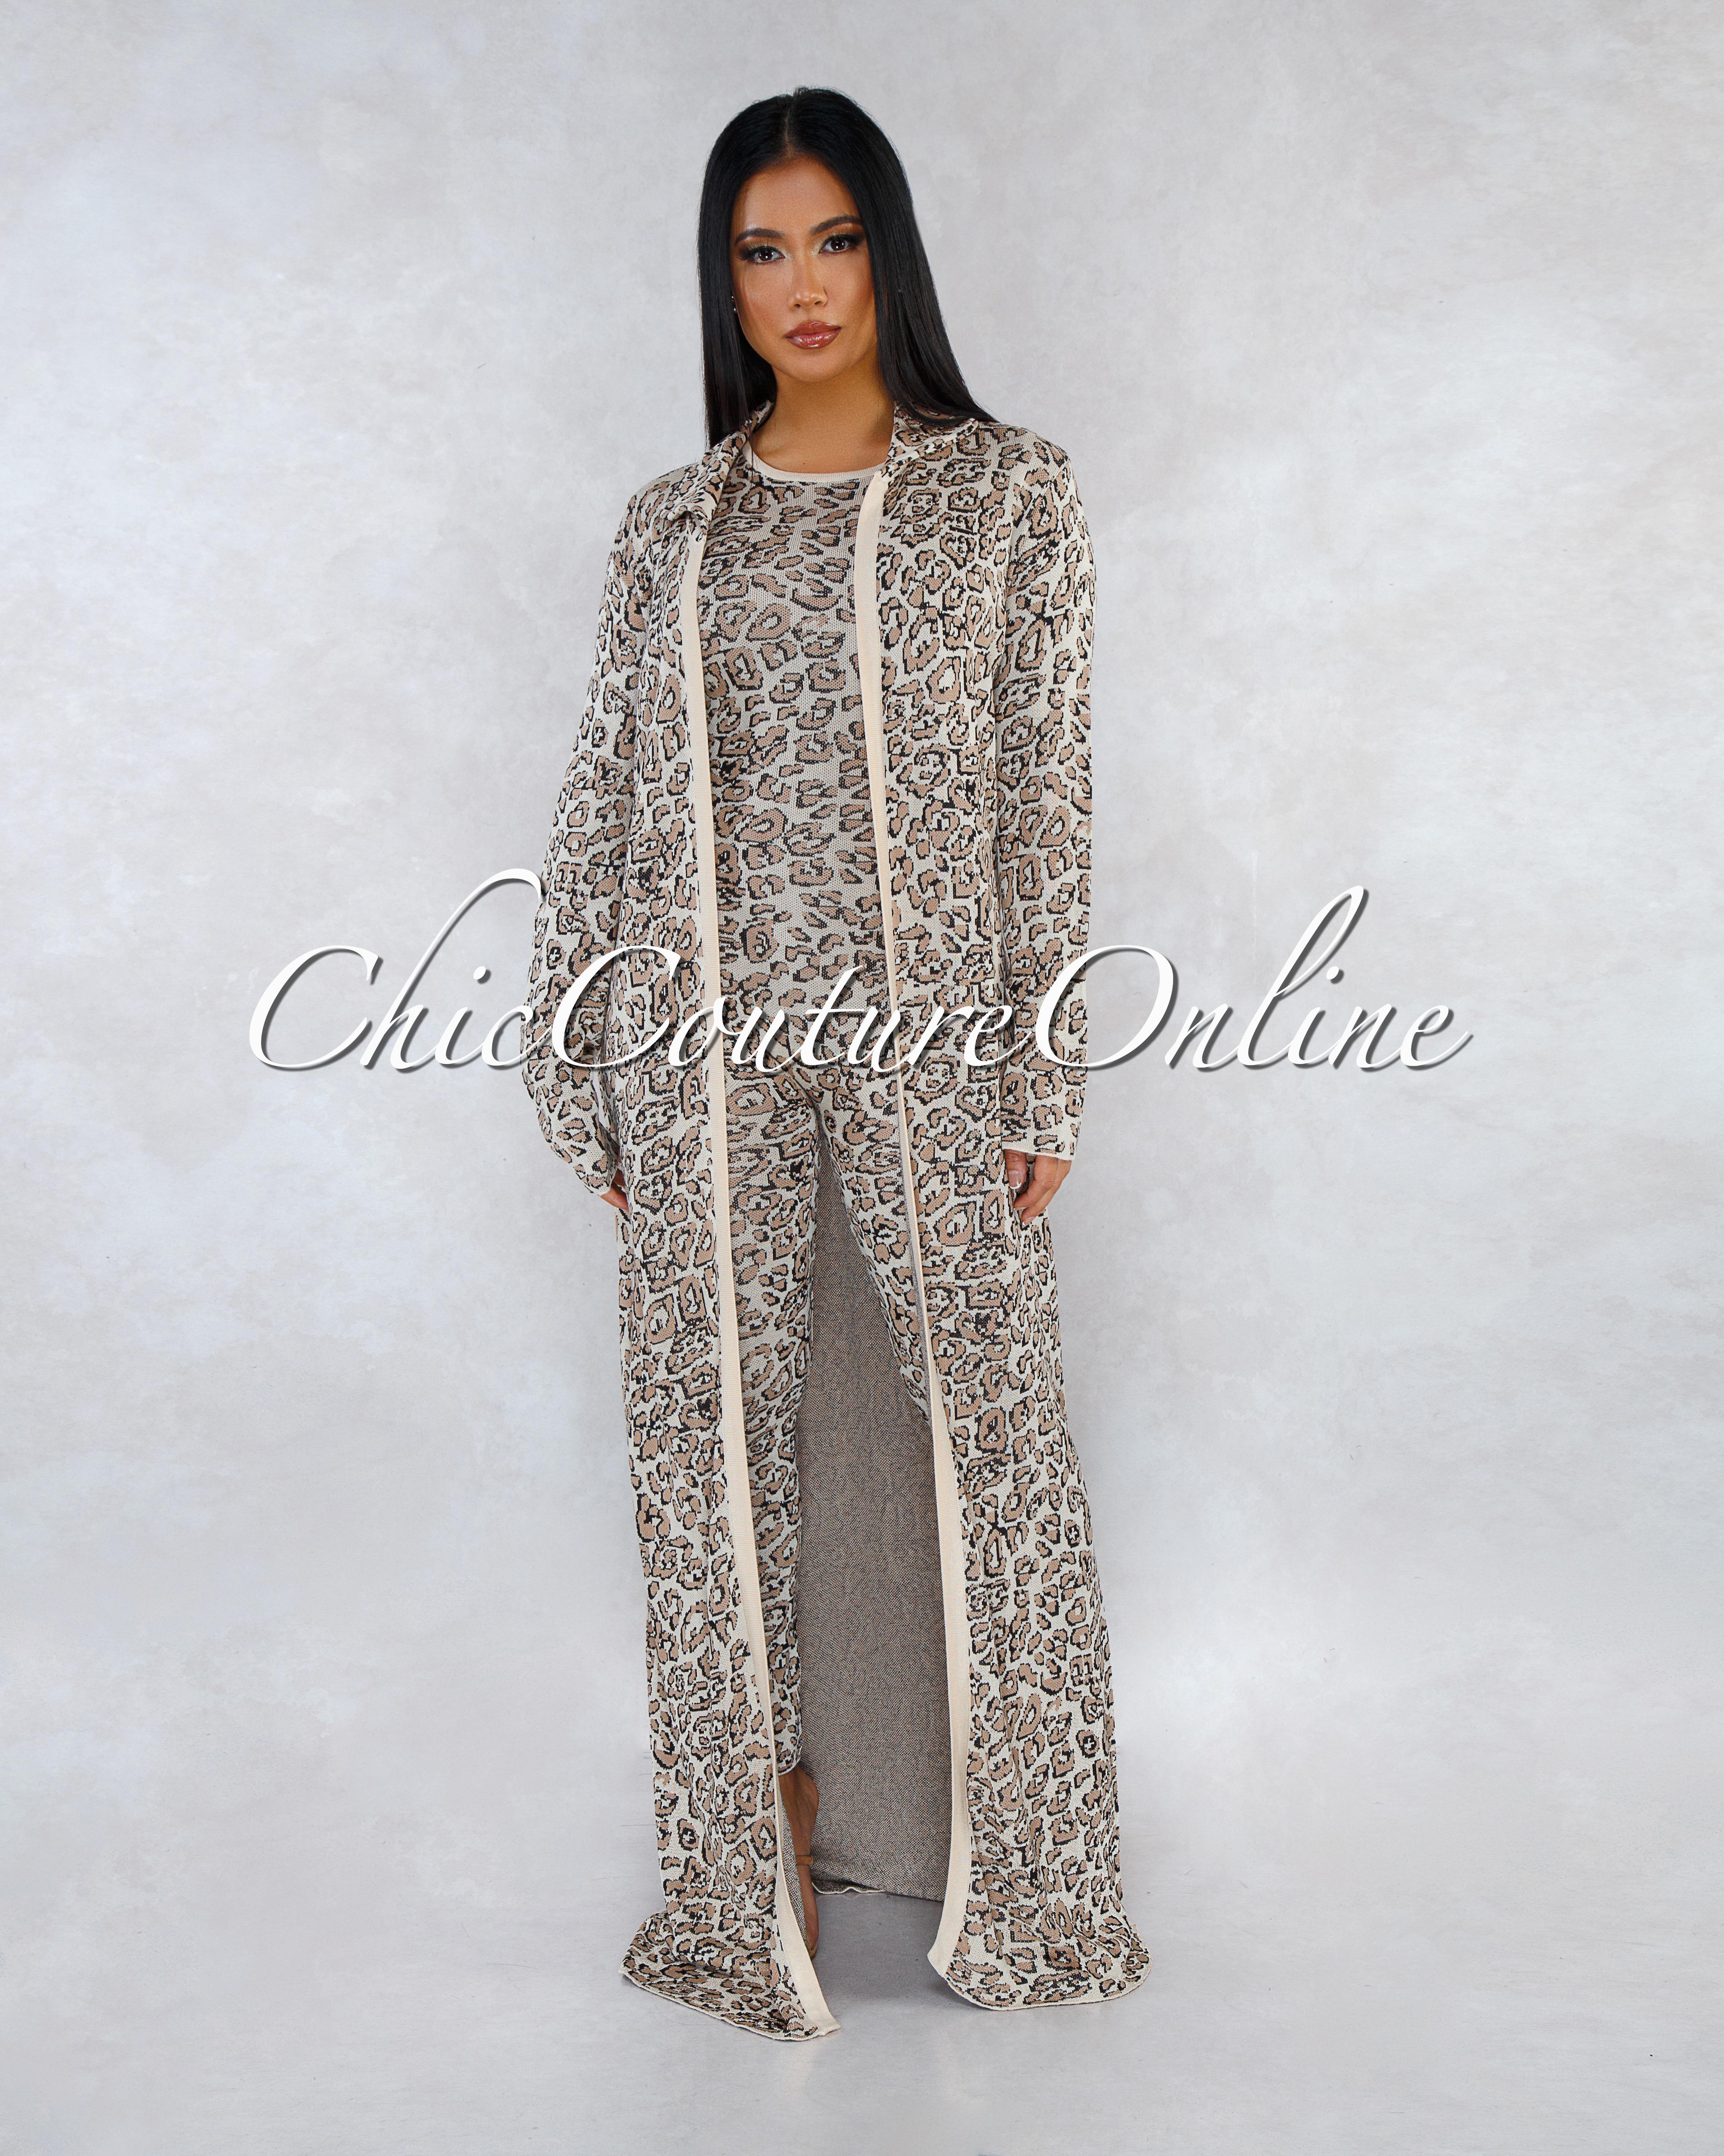 Olympya Nude Leopard Print Knit Long Sleeves Jumpsuit